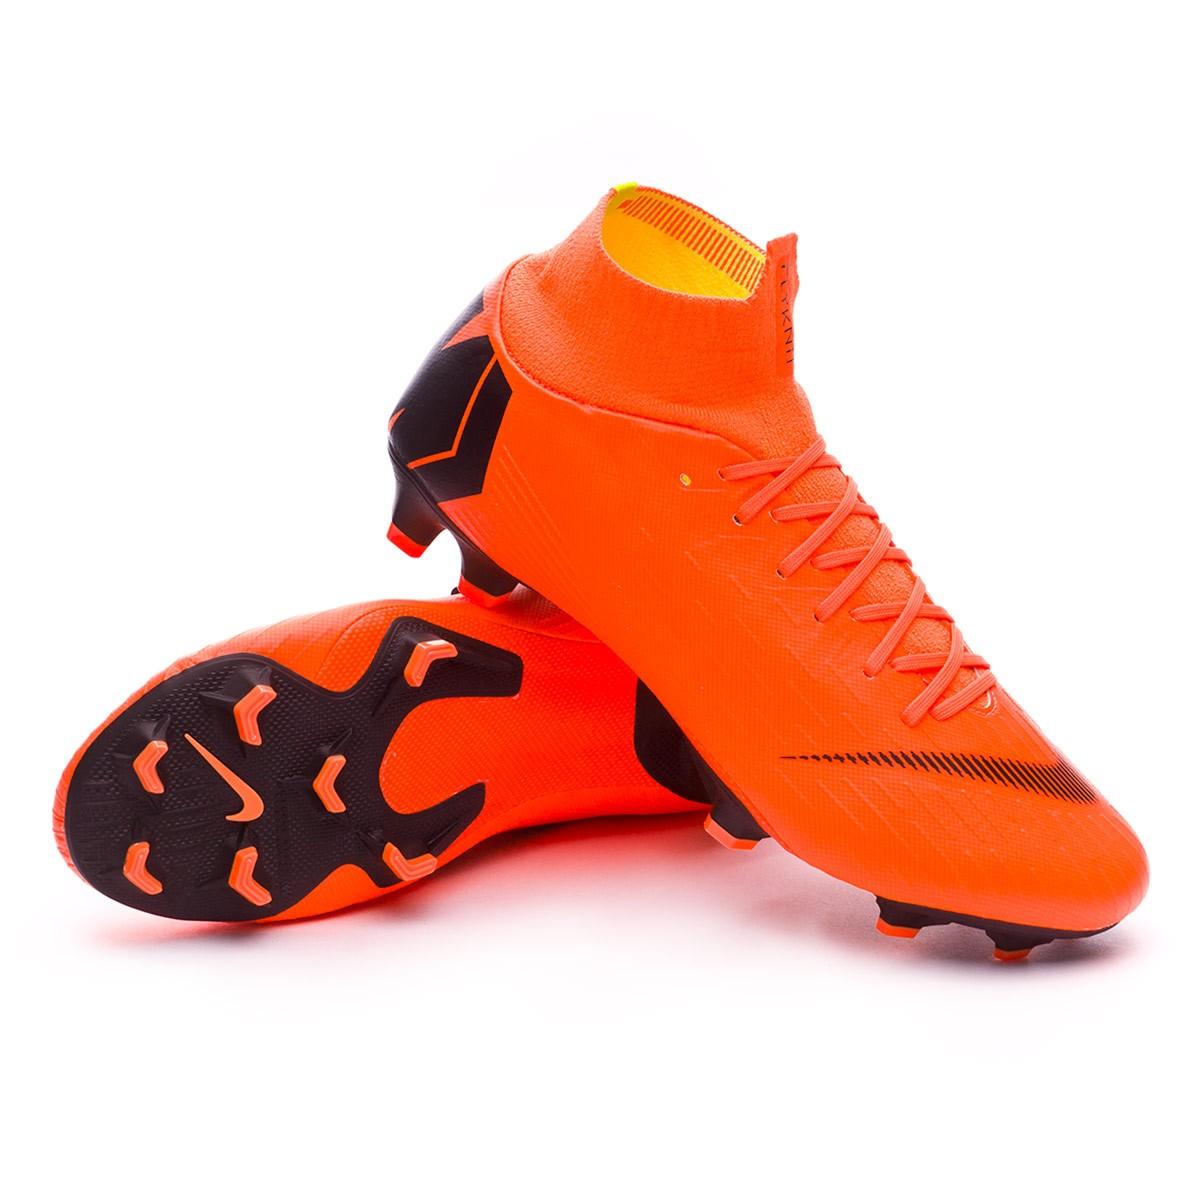 Nike Mercurial Superfly Vi Pro Fg jdwVx